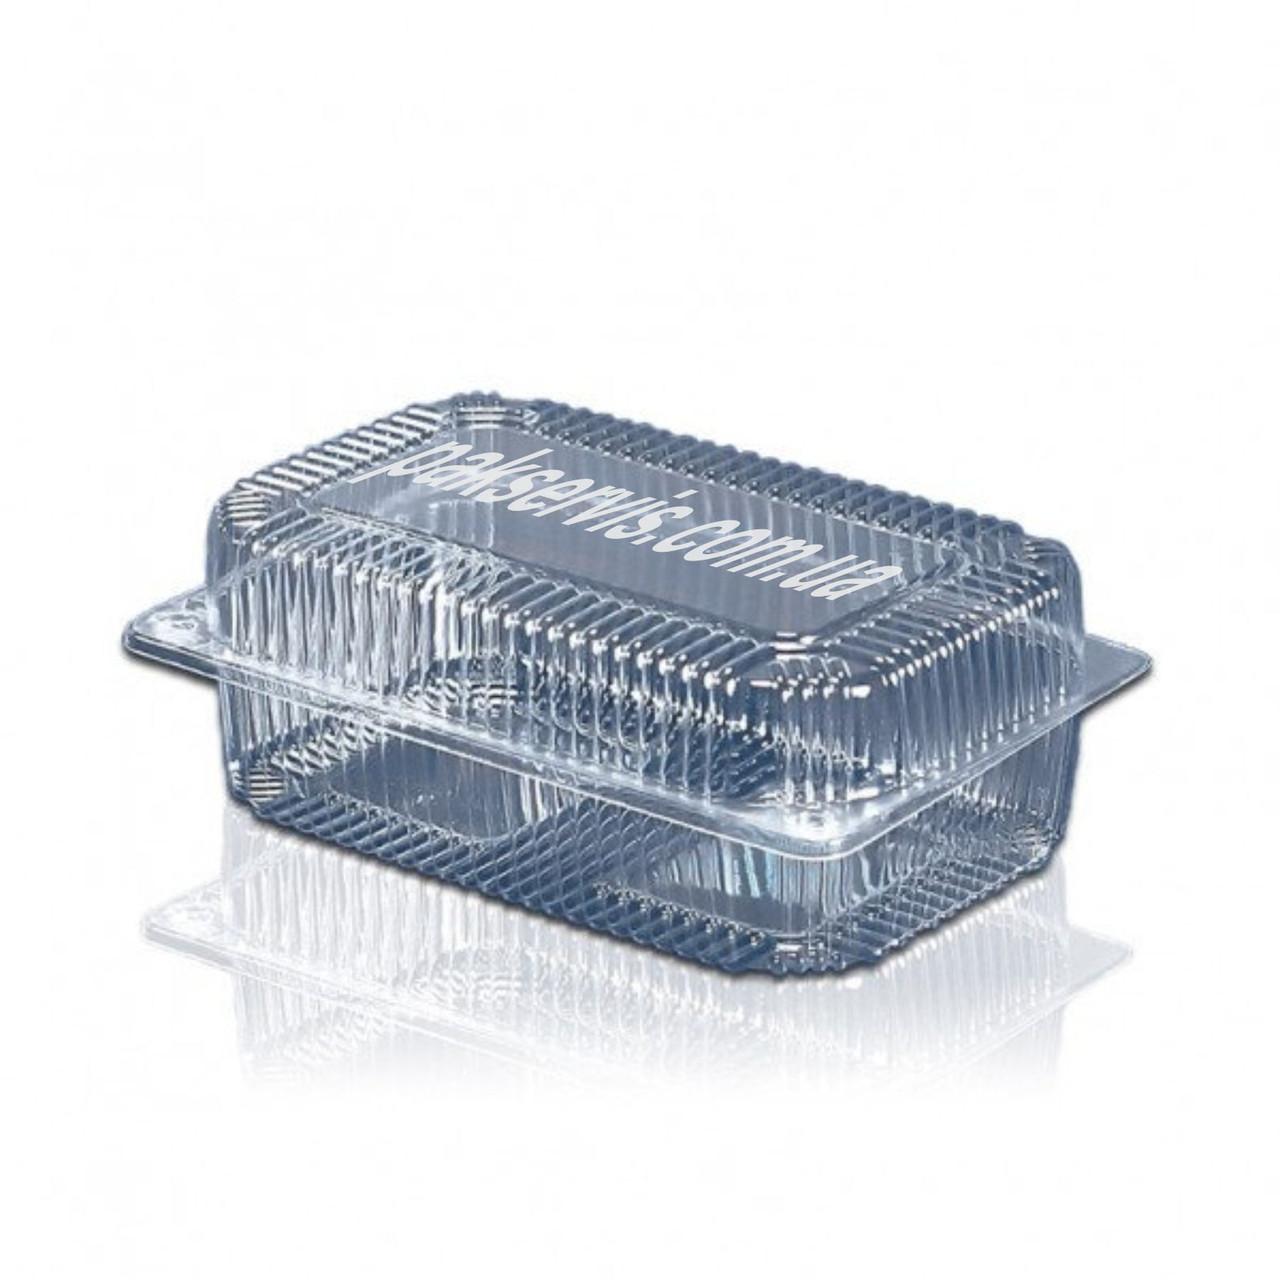 Упаковка ПС-120 (1550мл) 1/500